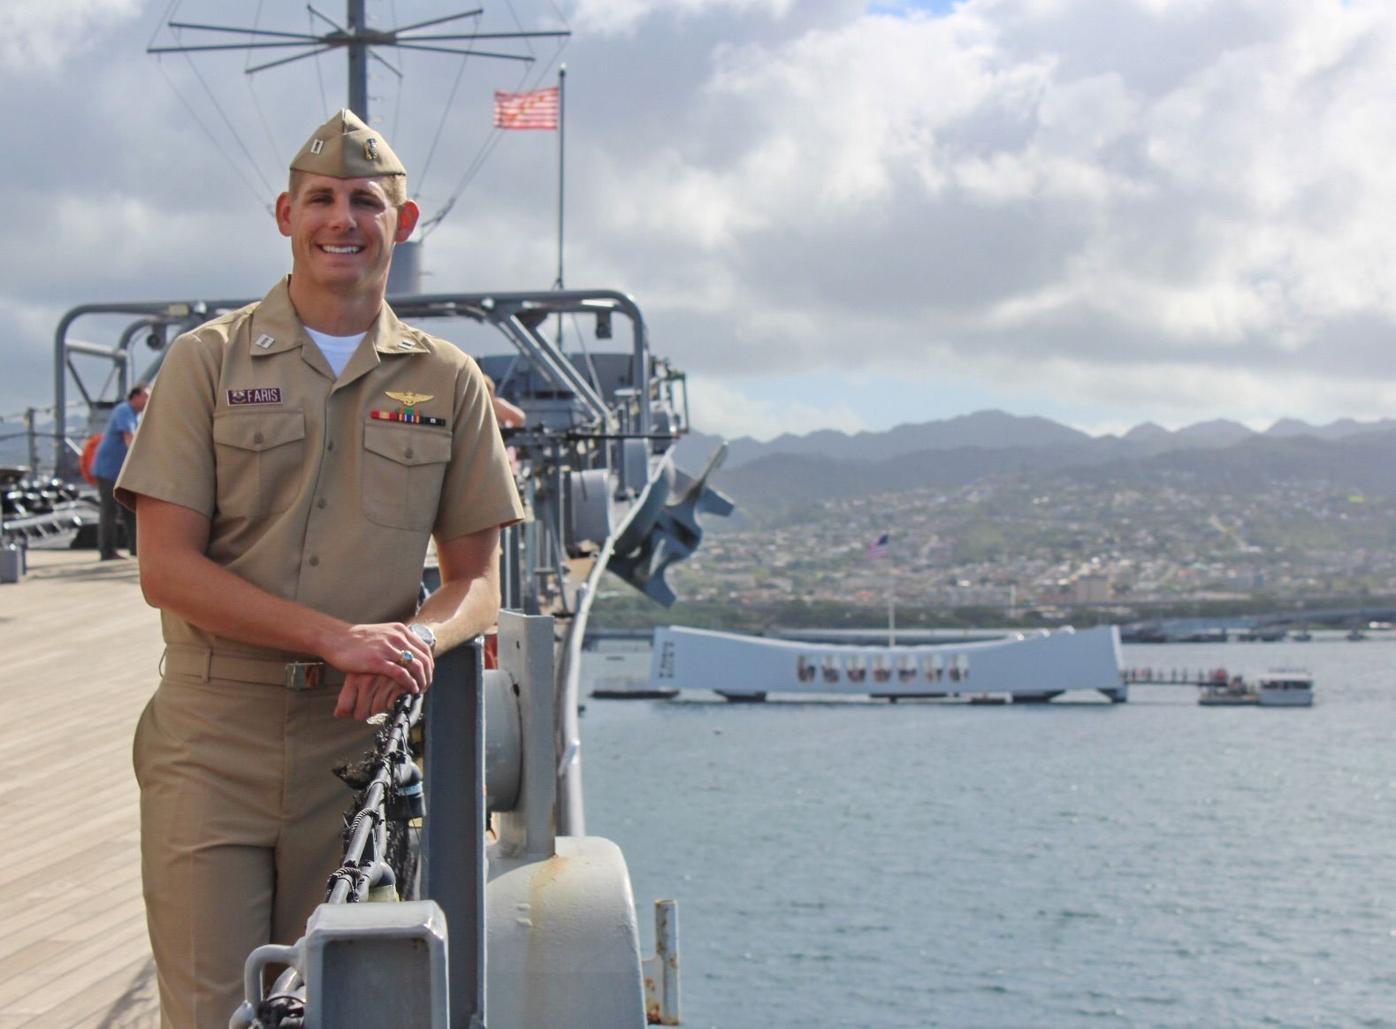 Faris uniform deployment